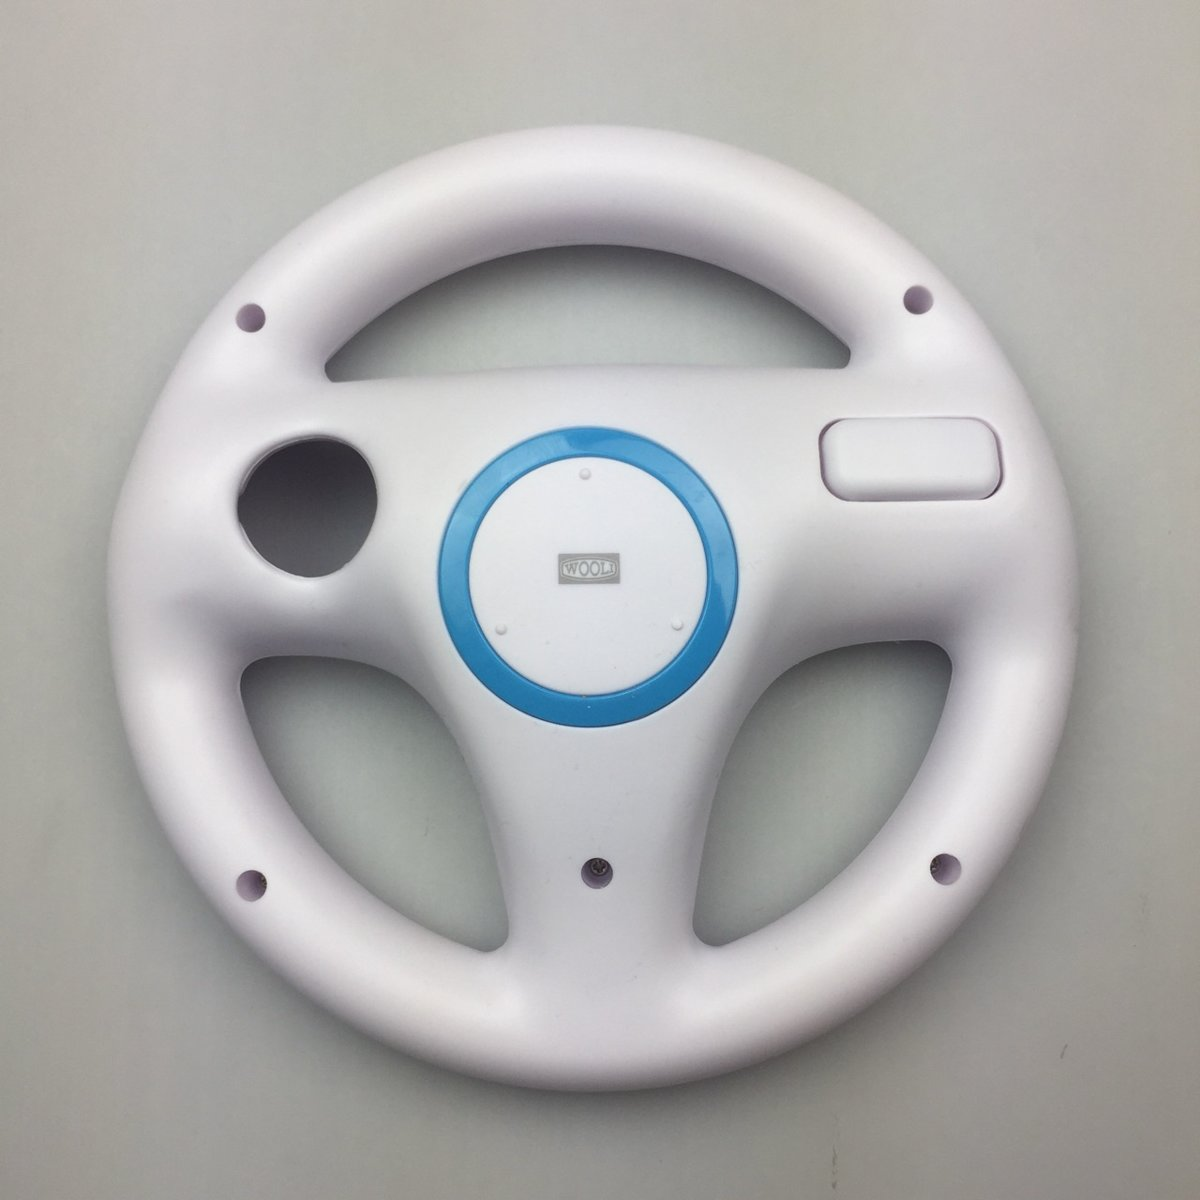 Nintendo Wii & Wii U Controller Race Stuurwiel/Steering Wheel - Wit kopen